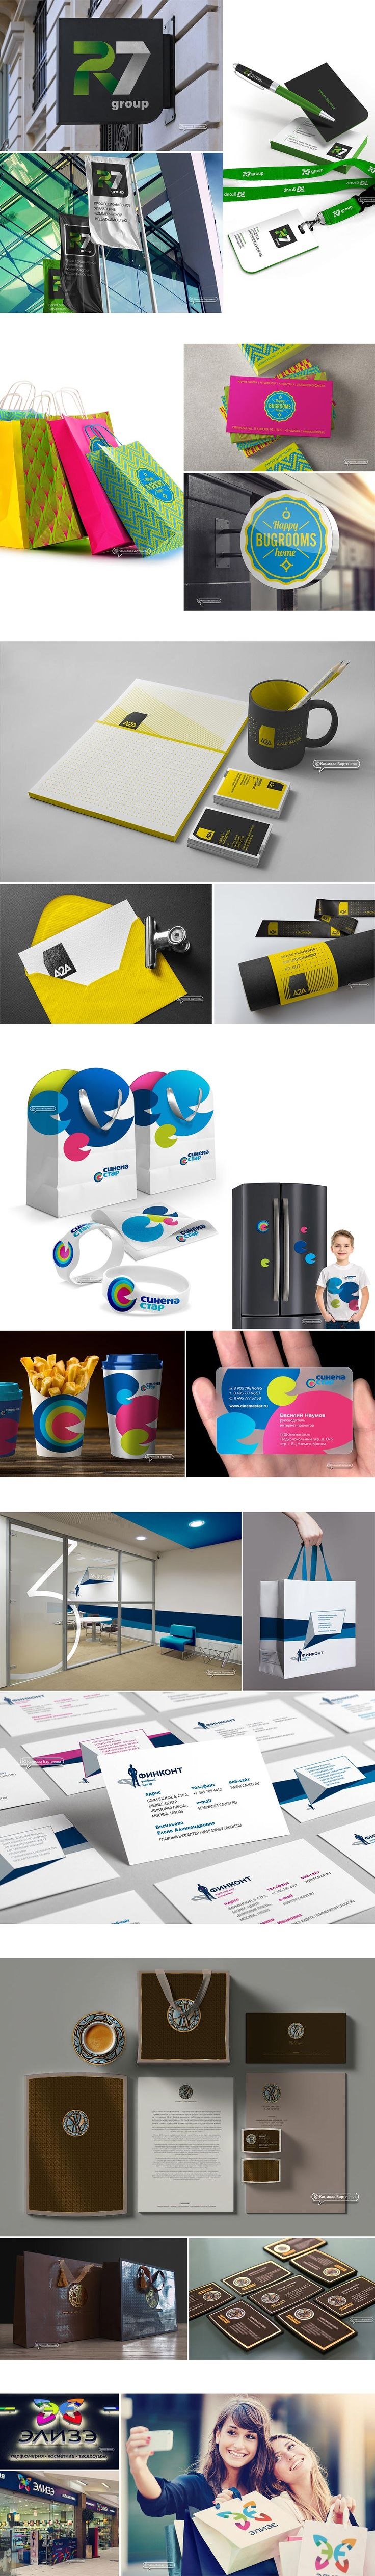 Корпоративный брендинг